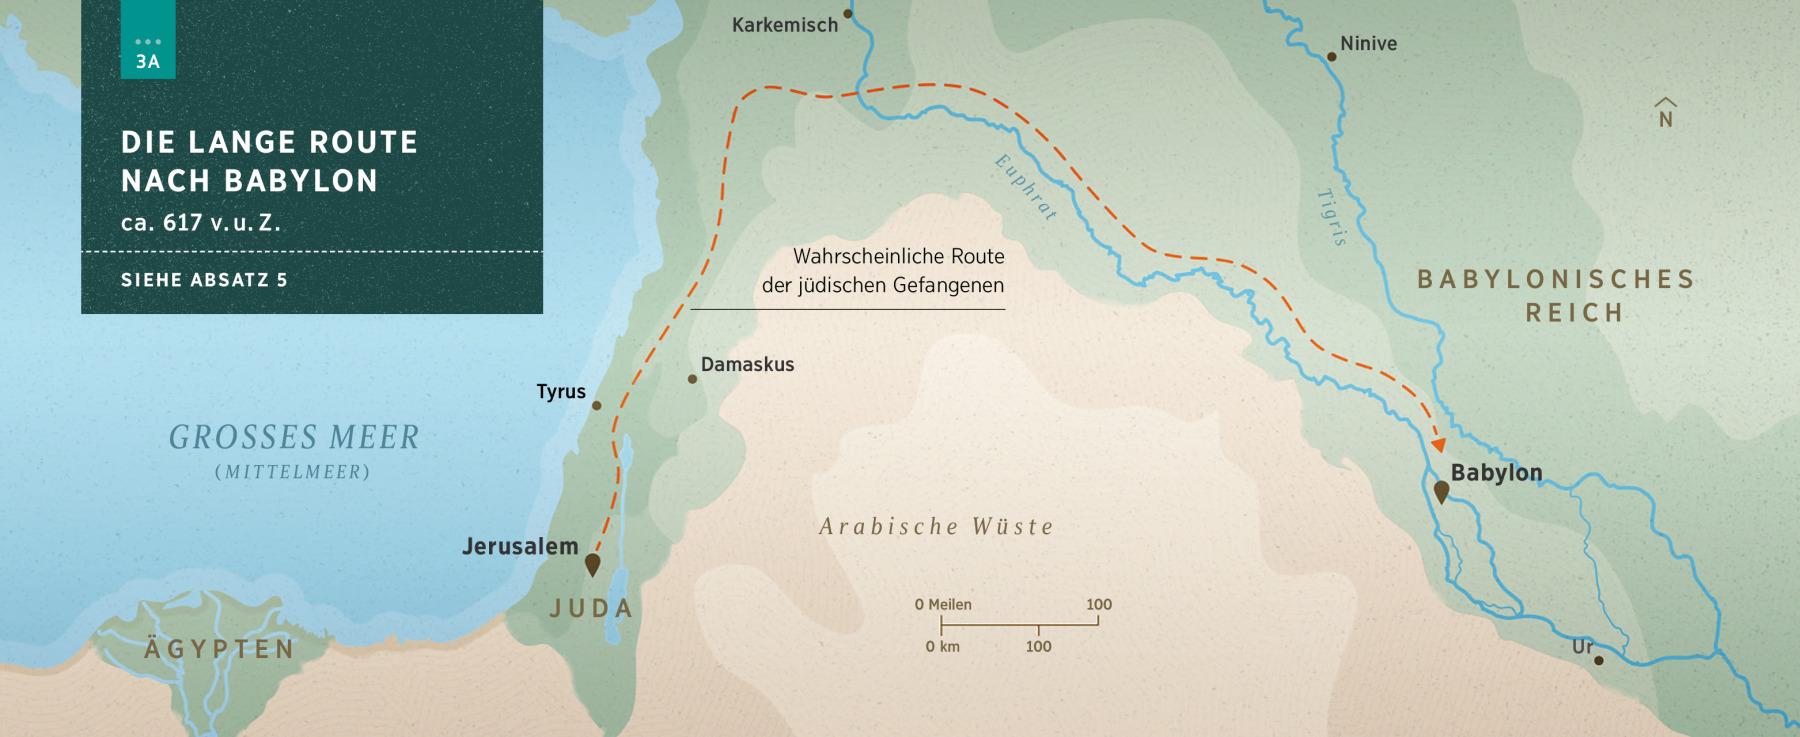 Babylon Karte.Gefangenschaft In Babylon Karte Der Route Jerusalem Babylon